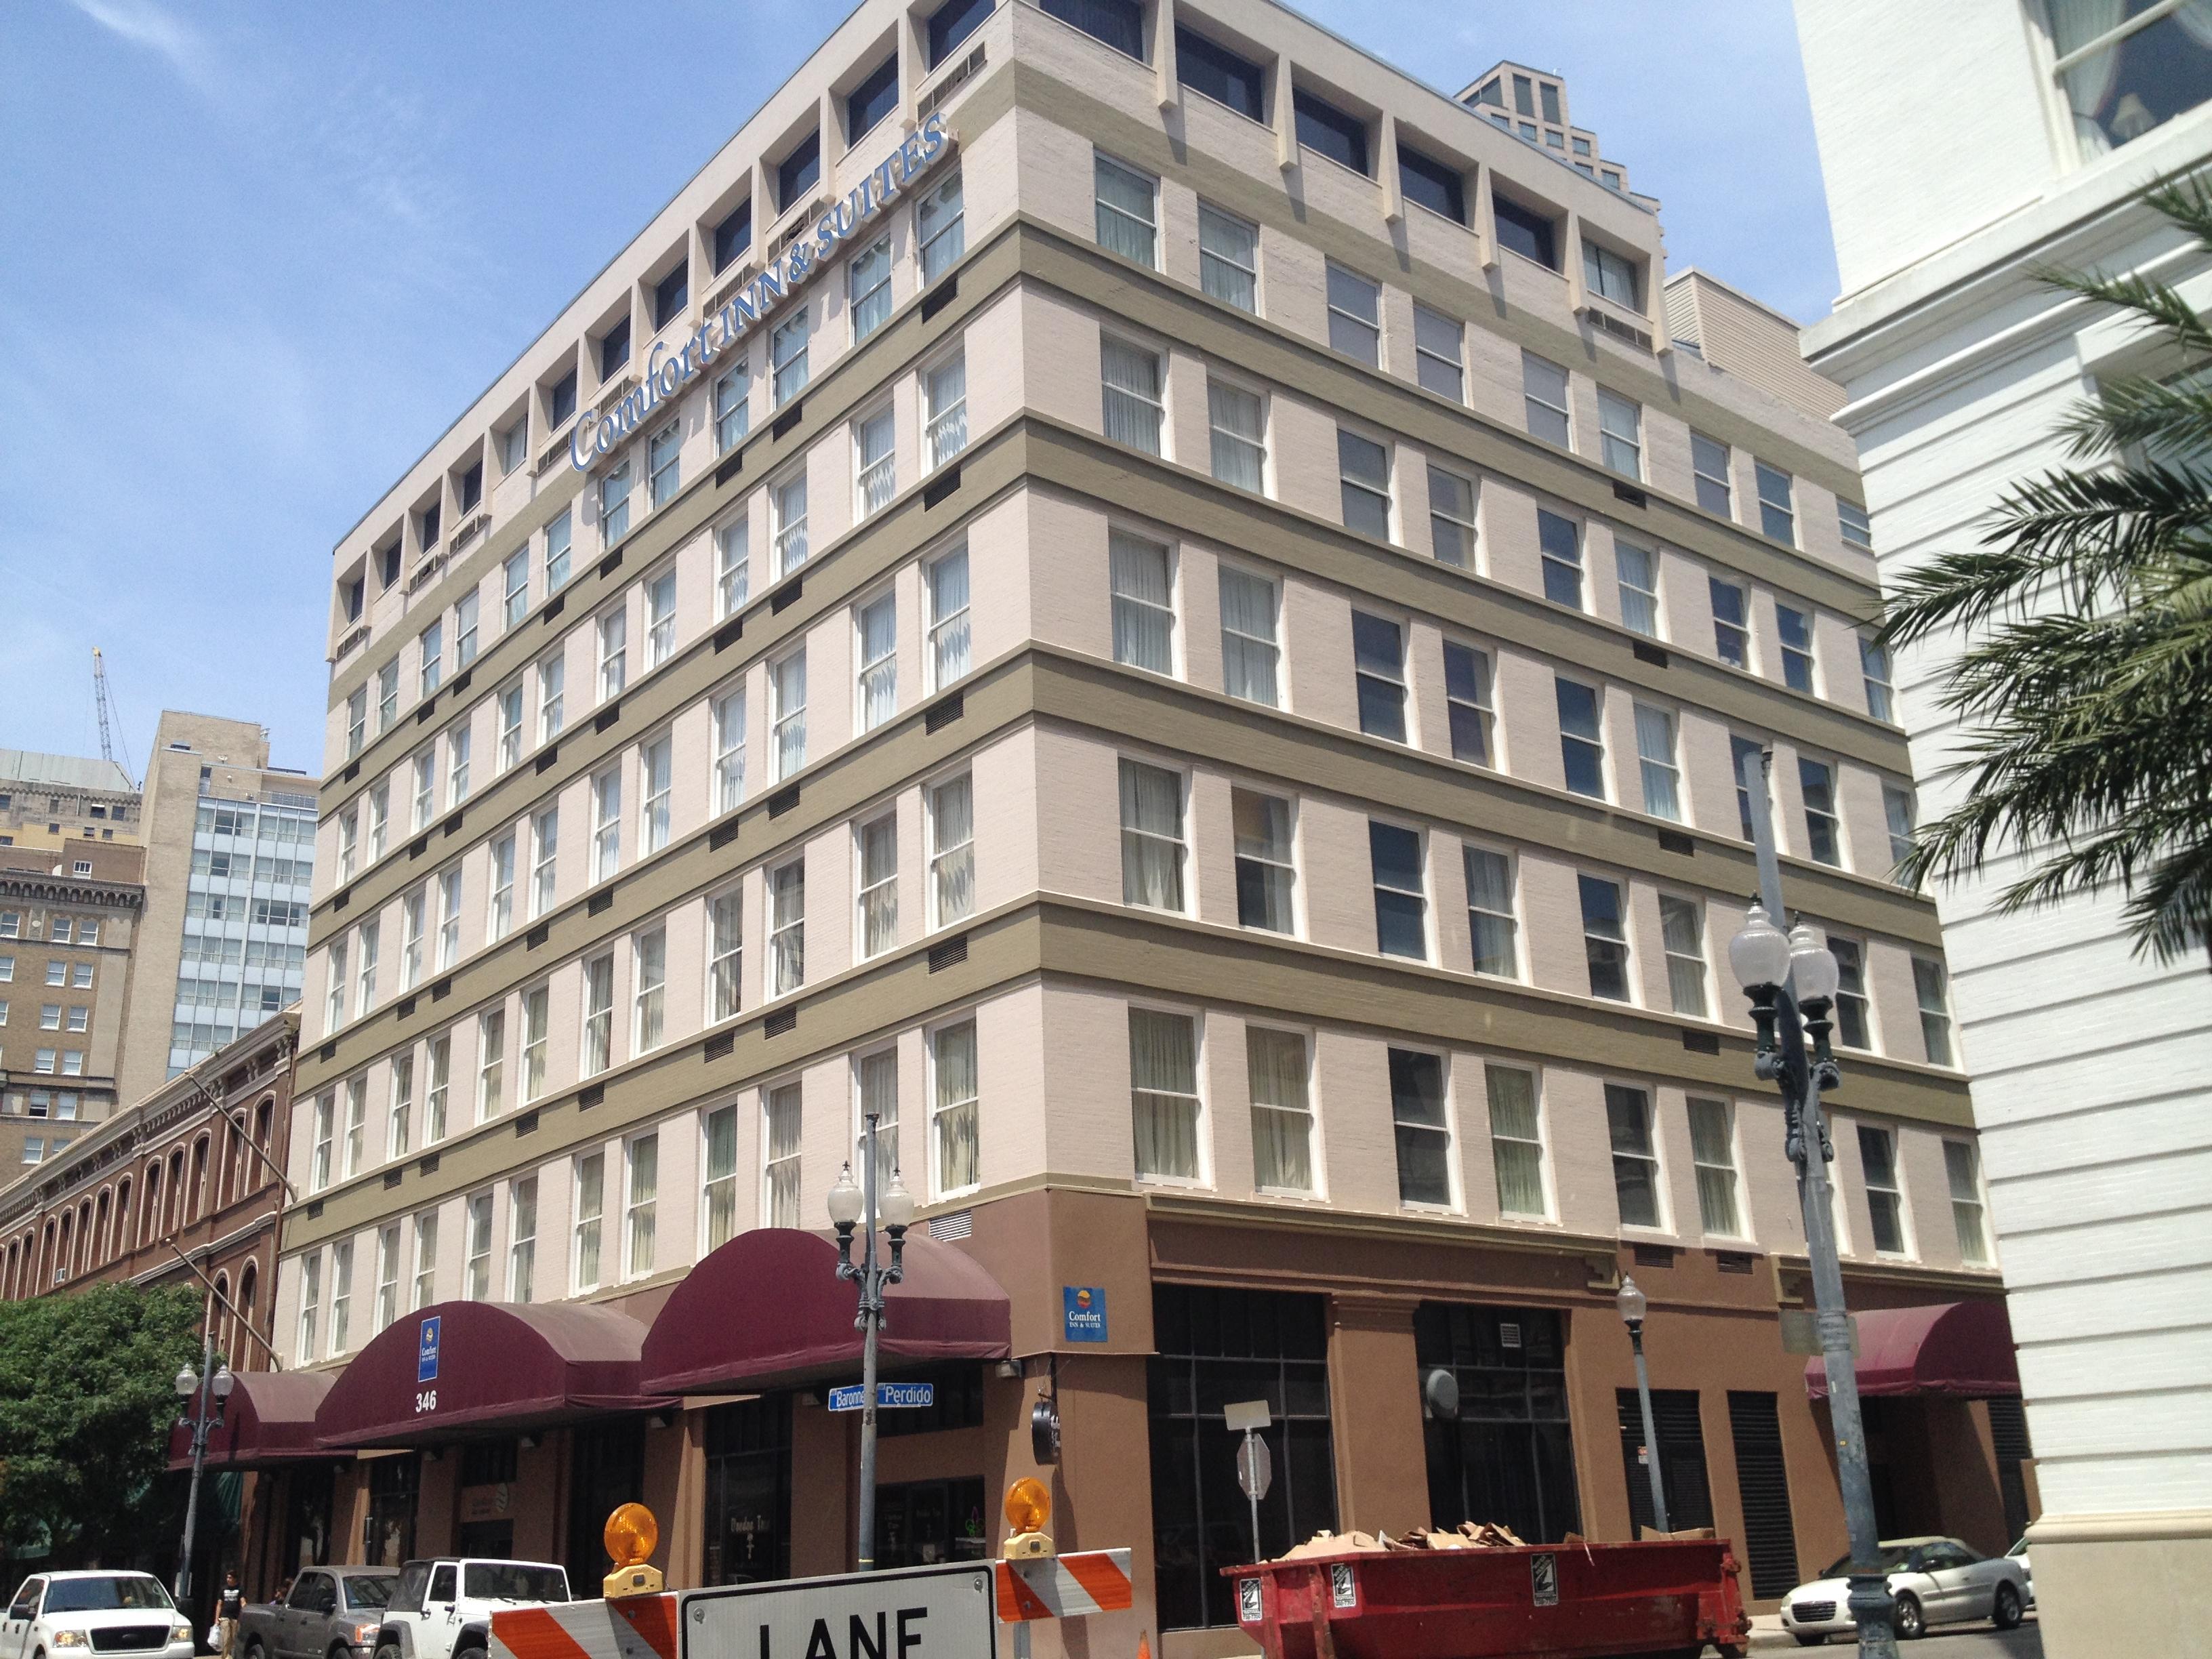 Comfort Inn & Suites, New Orleans